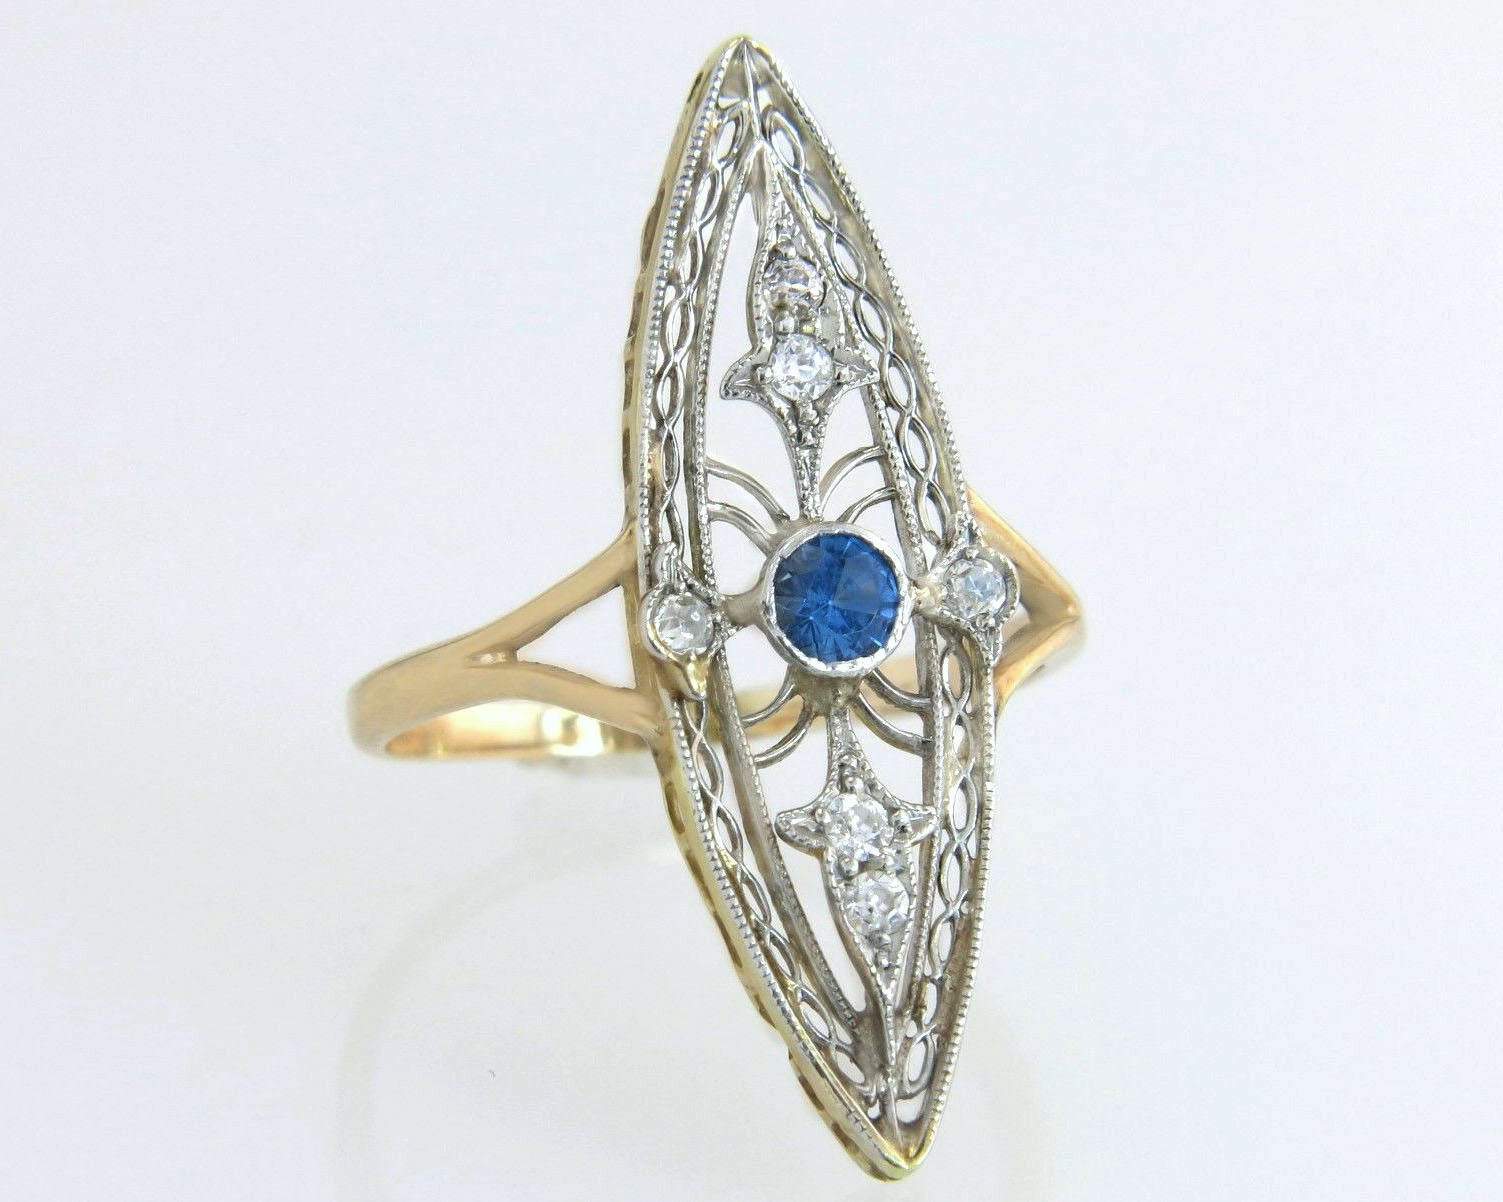 Antique Estate 14K Two Tone gold .20ct Diamond & London bluee Topaz Art Deco Ring